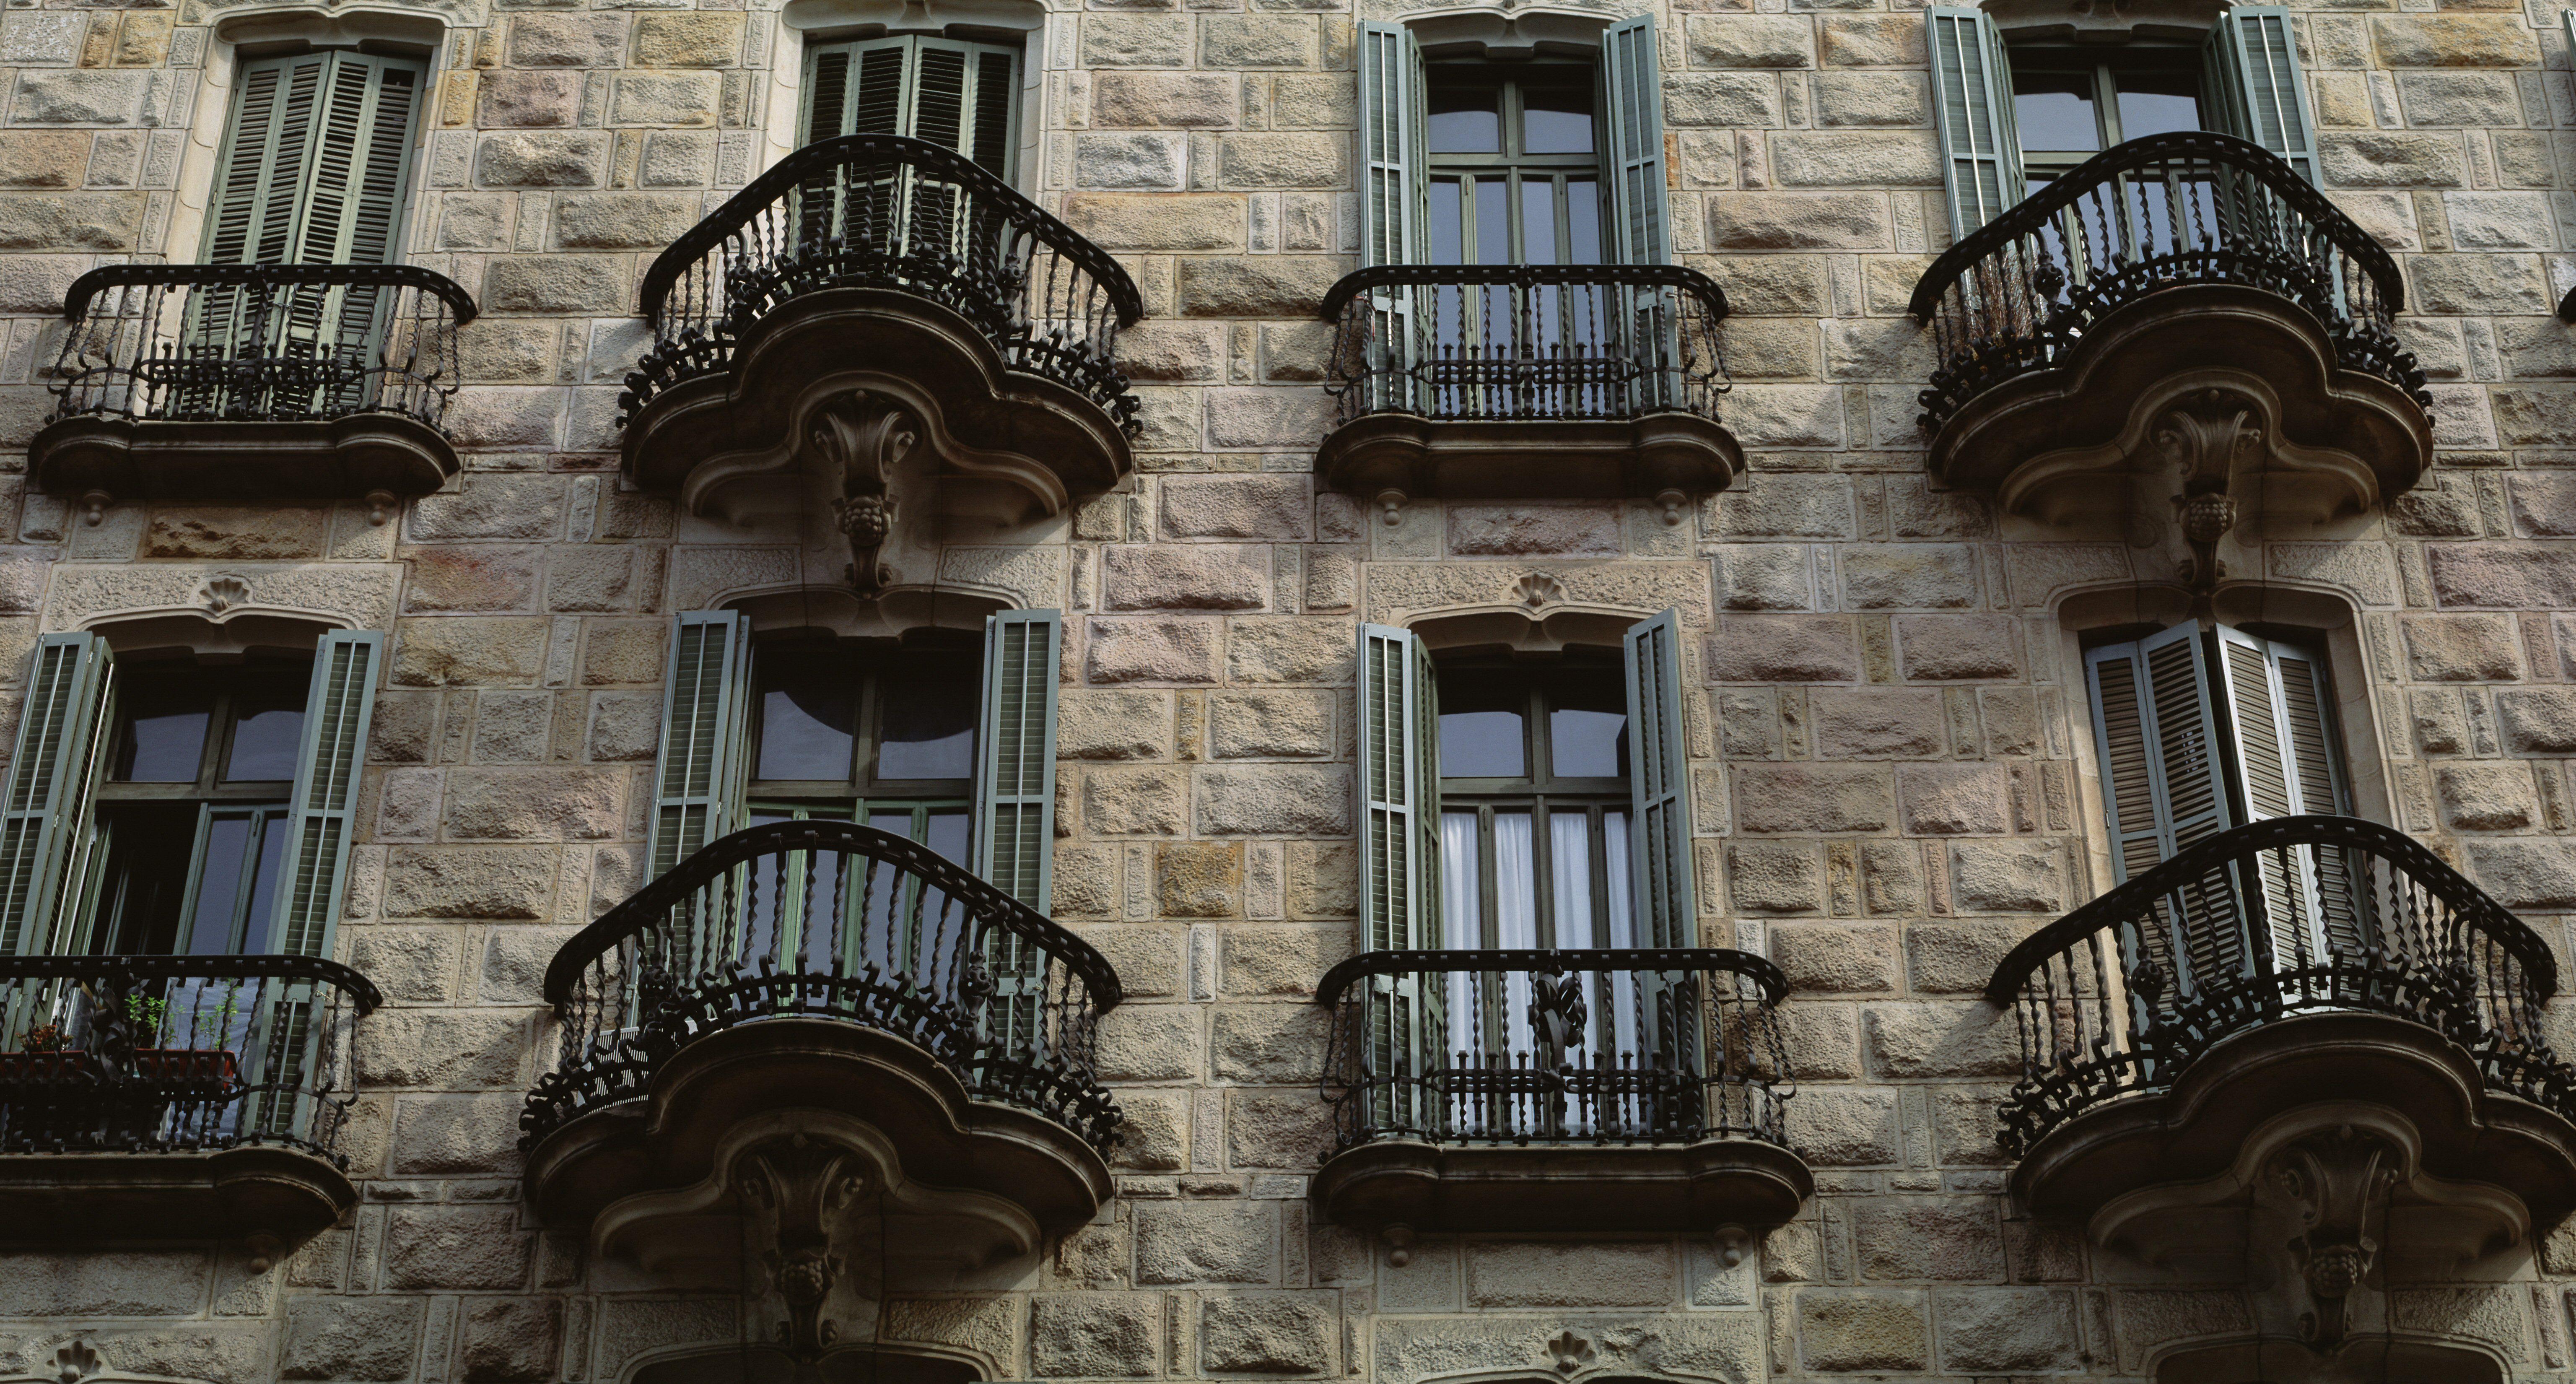 Casa Calvet by Antoni Gaudí in Barcelona